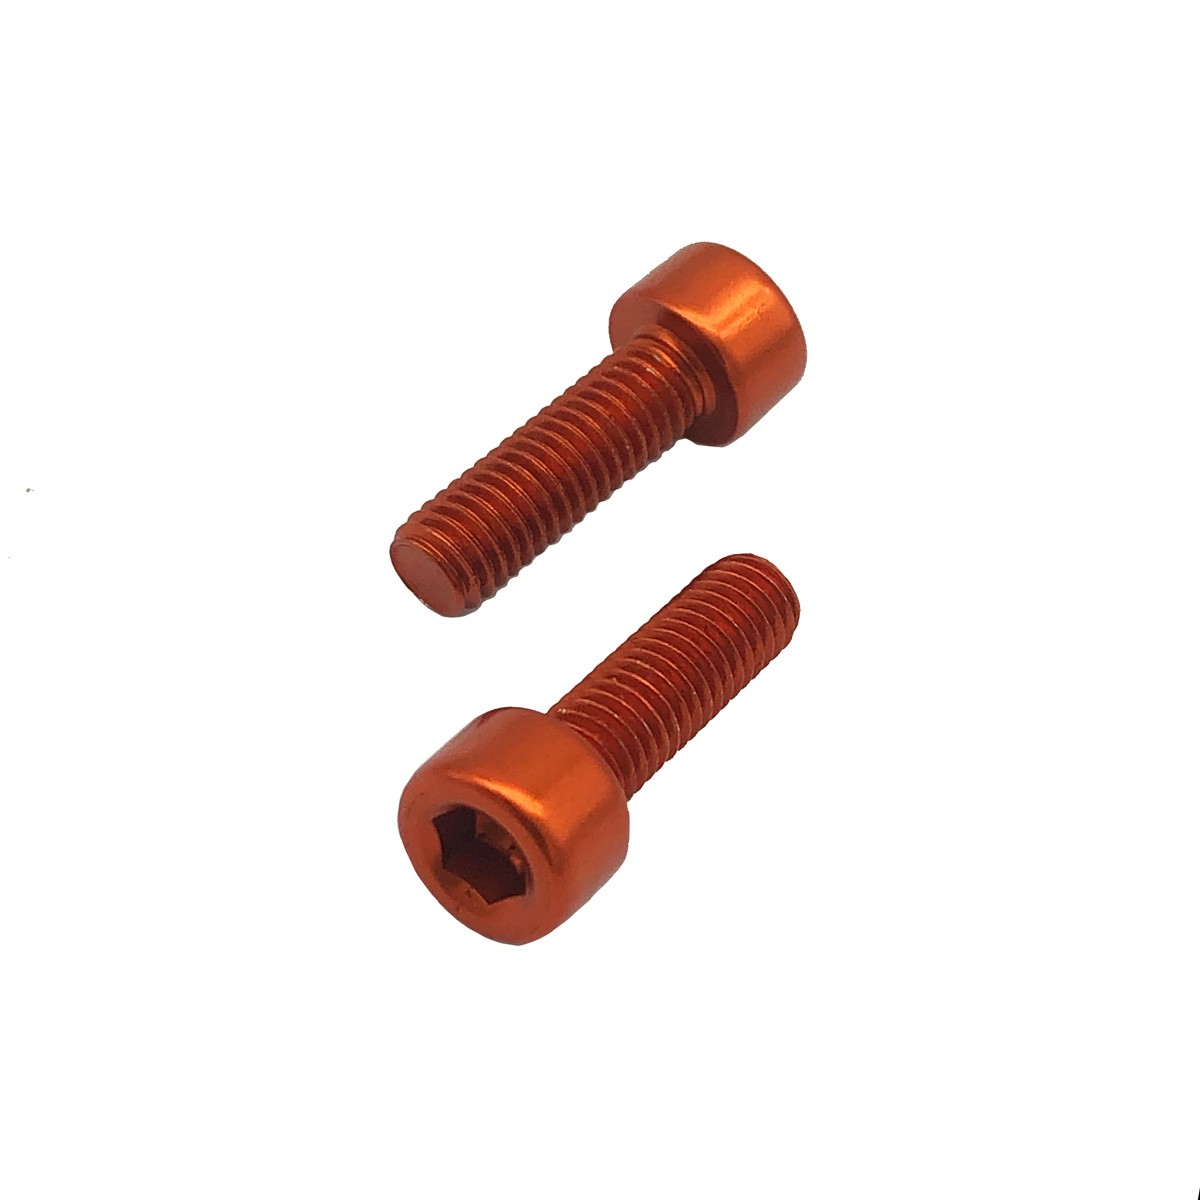 Parafuso Allen de Aluminio Socket Cap M5 x 10mm Unidade Laranja